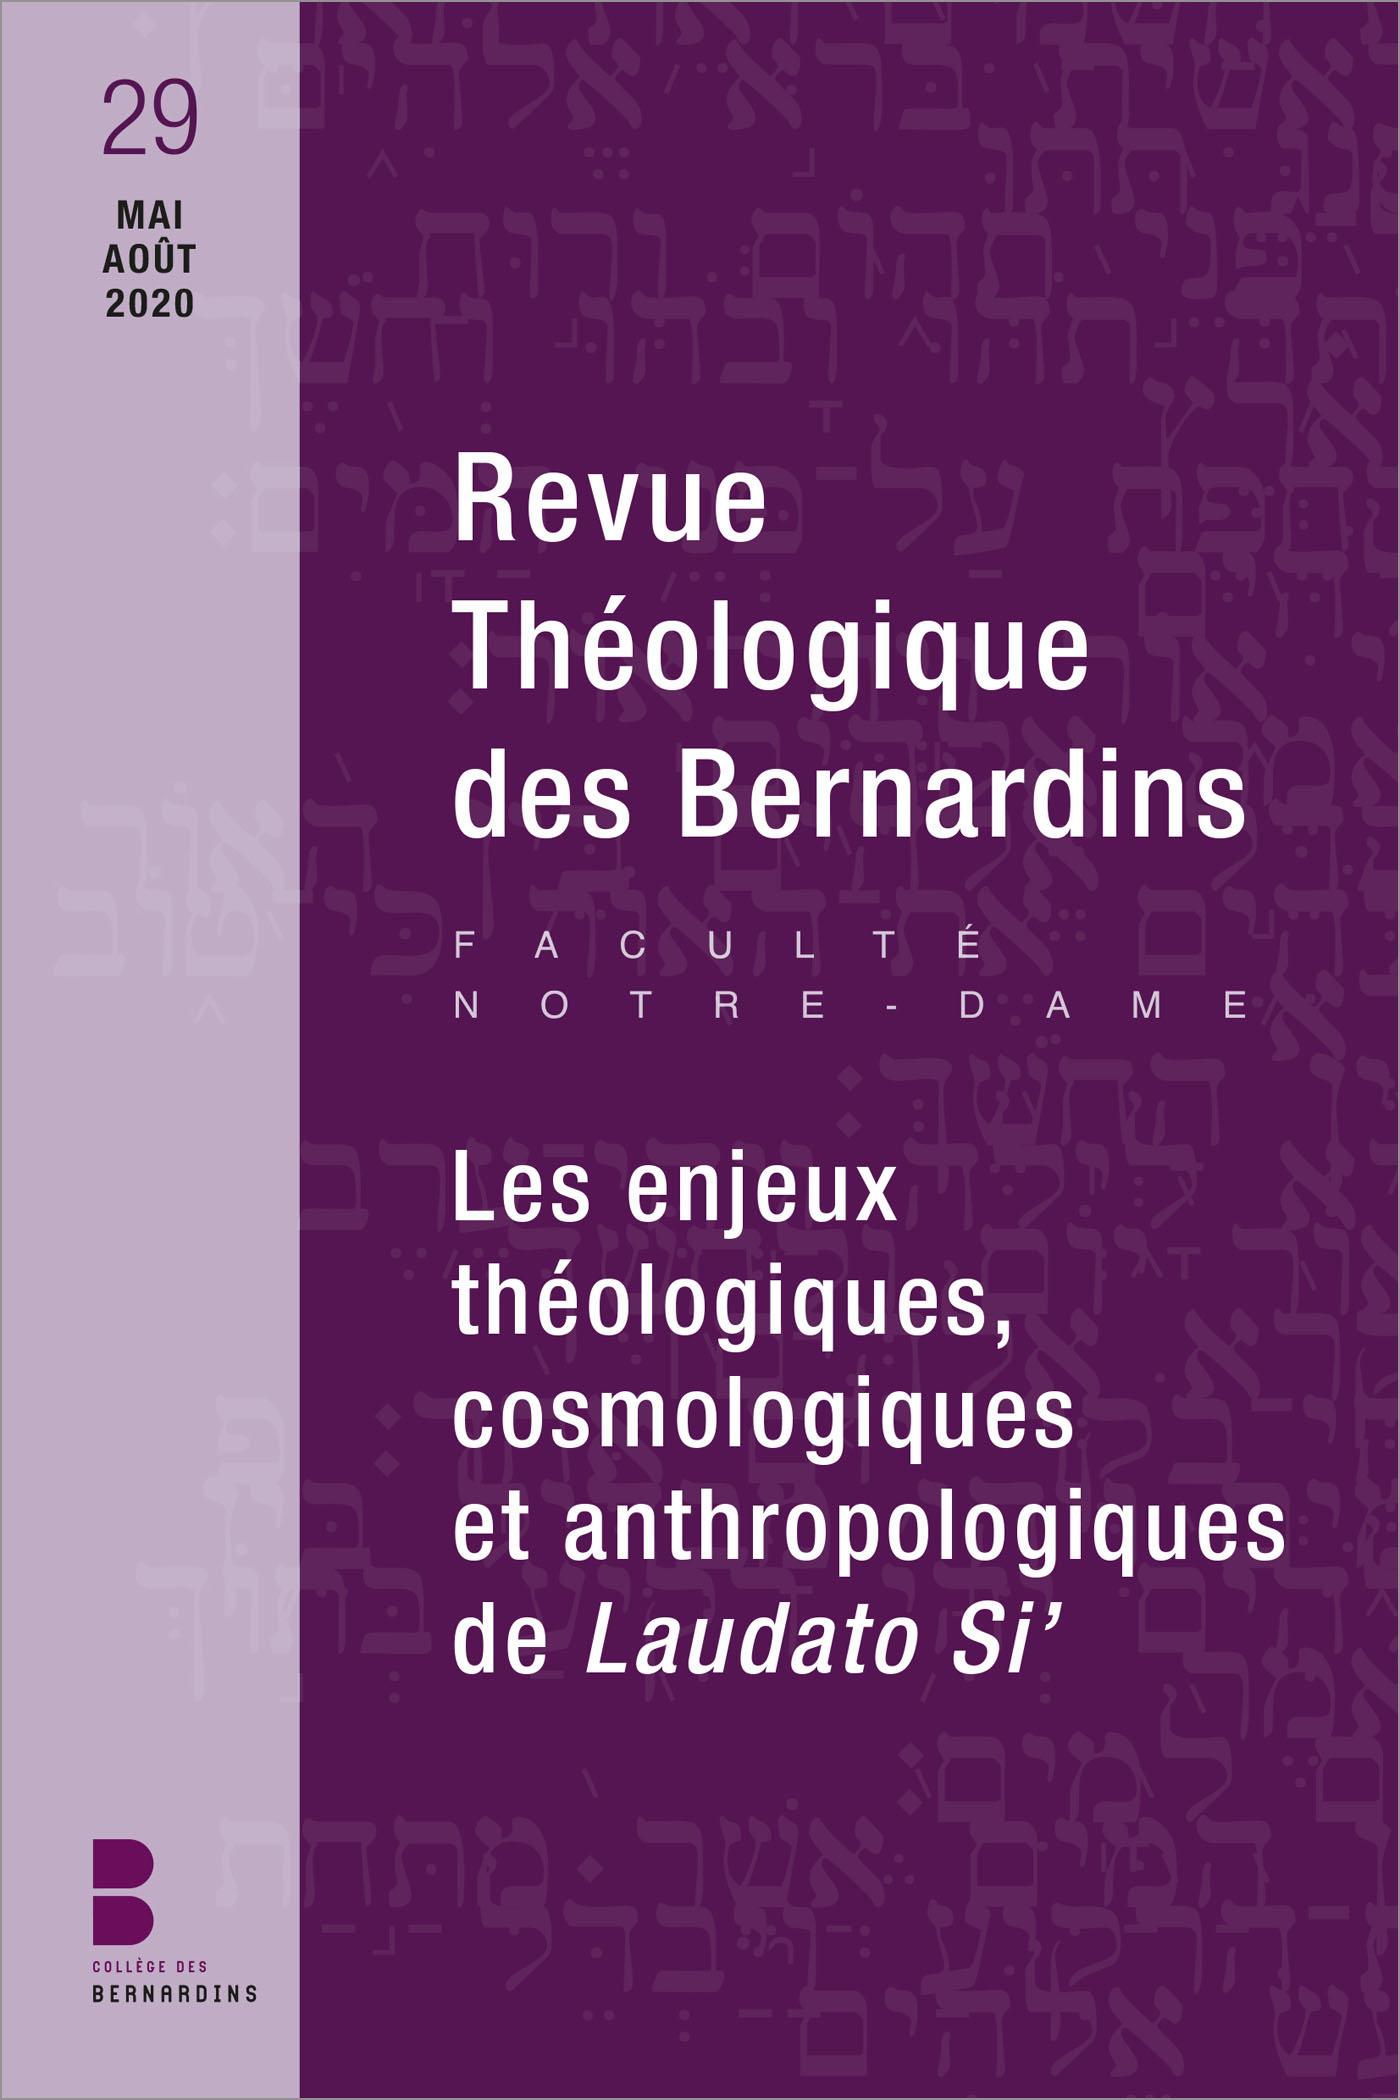 Revue théologique des Bernardins n°29